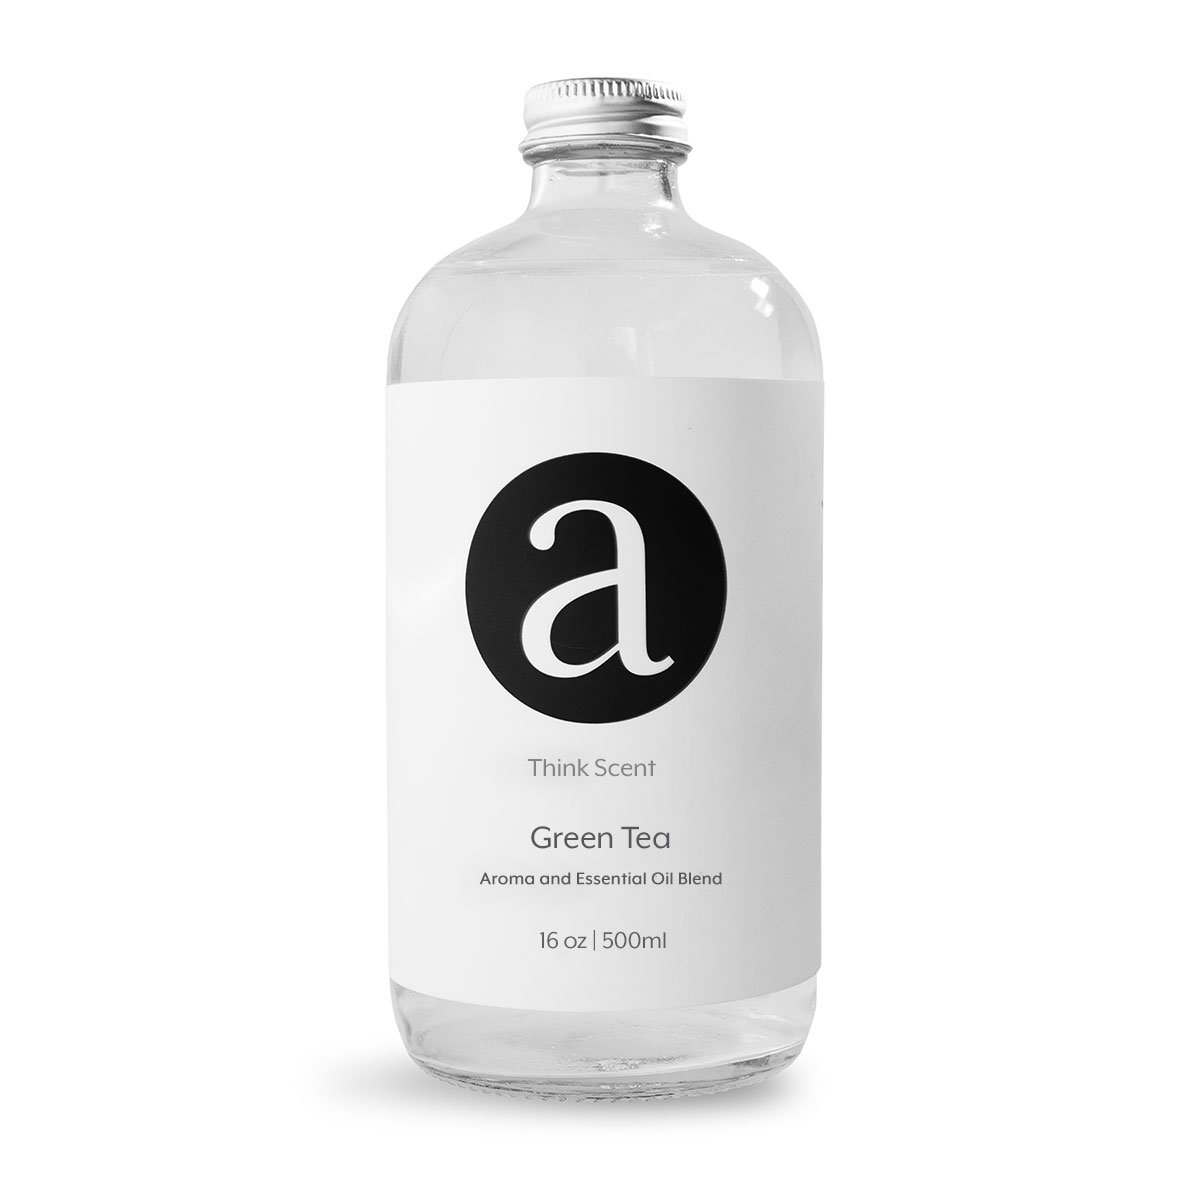 (Green Tea) Aroma / Fragrance Oil For AromaTech Air Freshener Scent Diffuser (500ml).